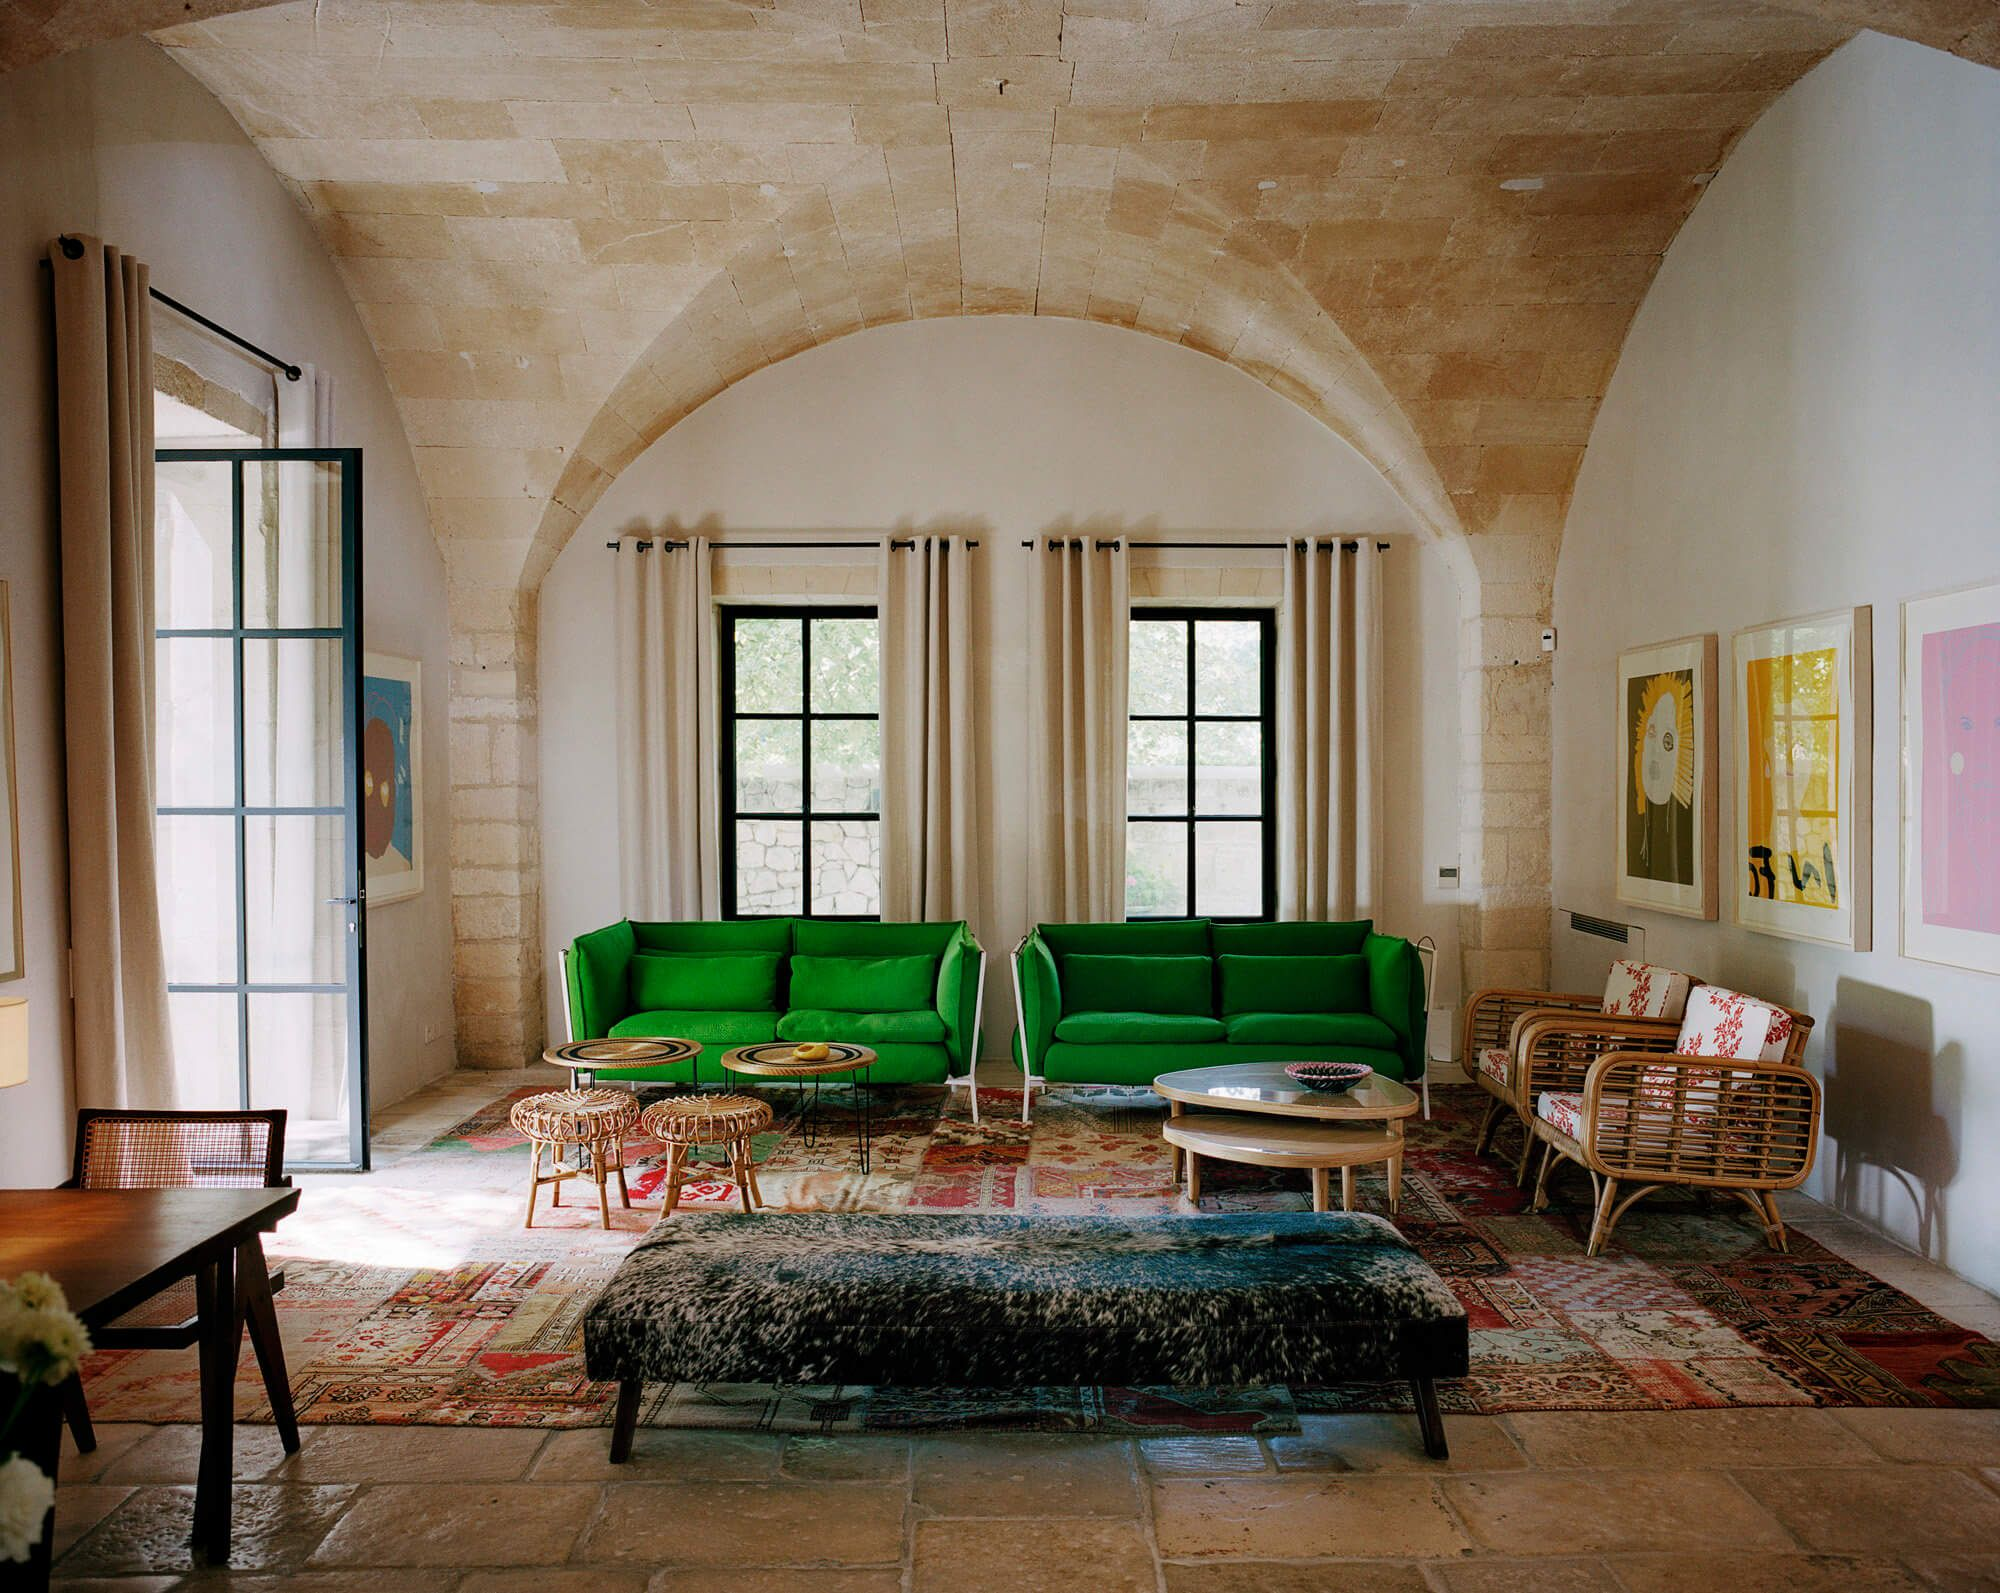 India Mahdavi Interior Design Interior Design Bedroom Eclectic Interior